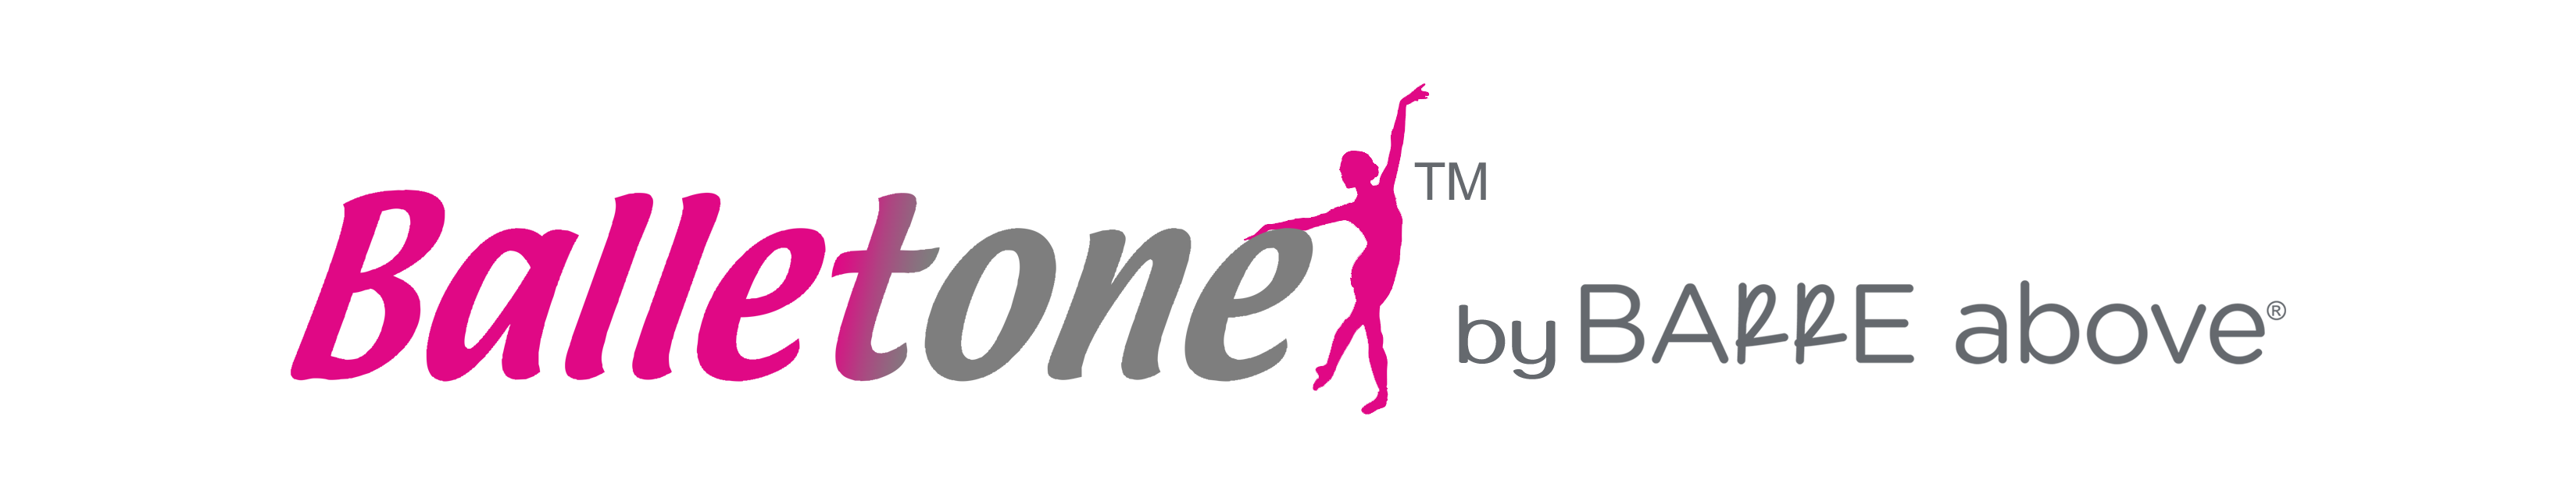 balletone-logo-new-1-.png